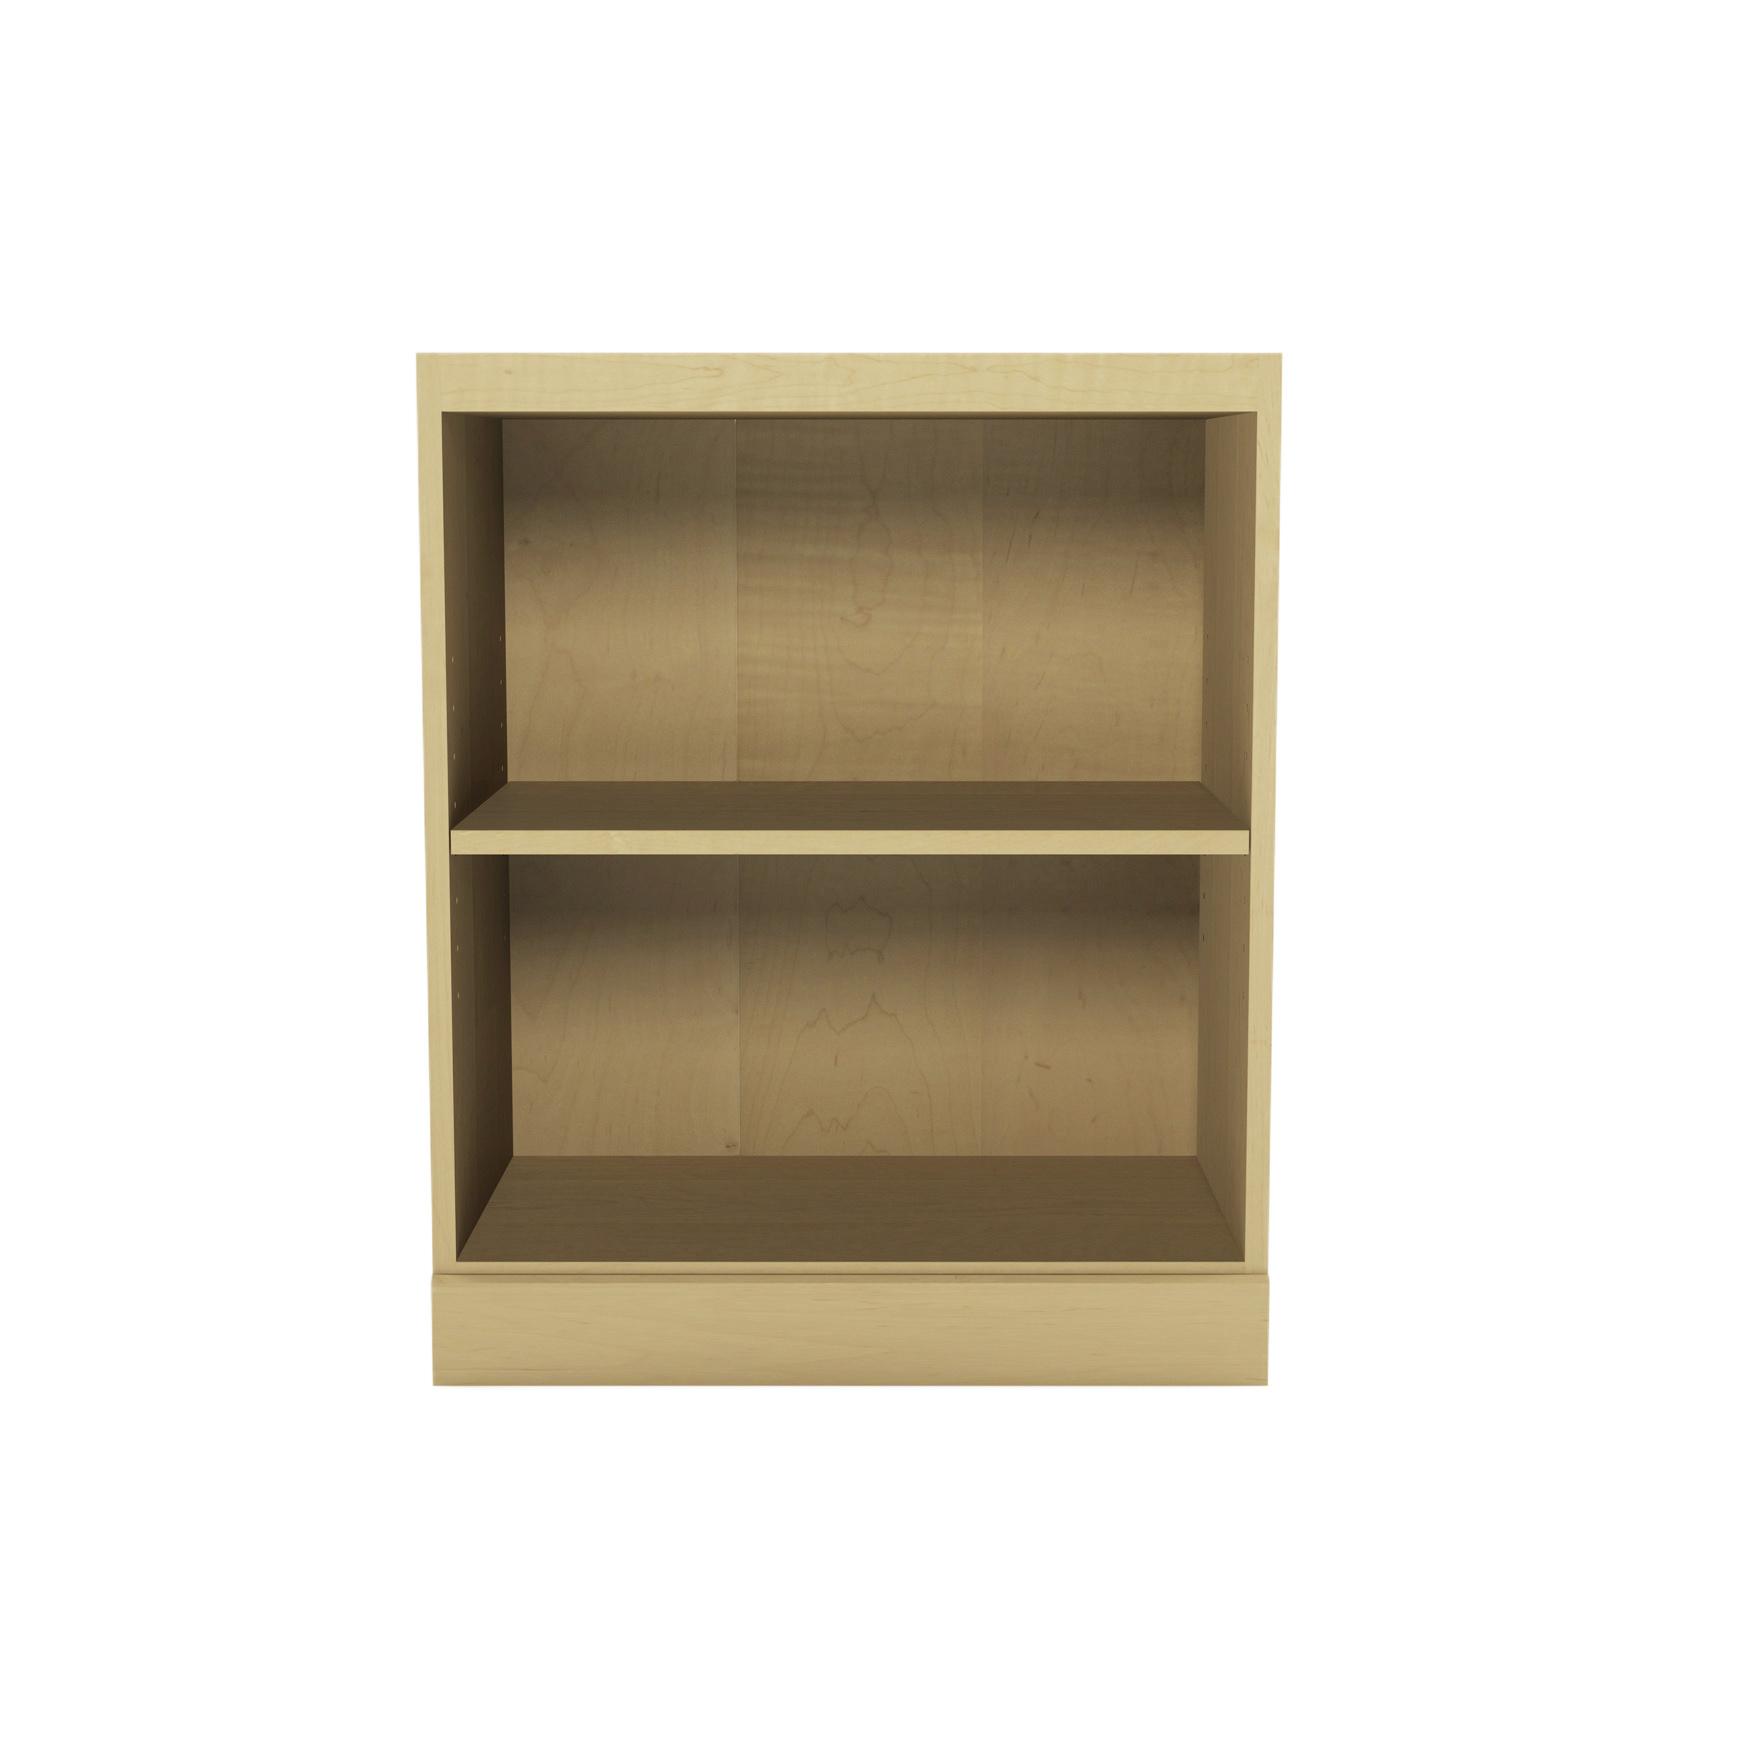 Flexmoderne 32″ In Height Deep Bookshelf